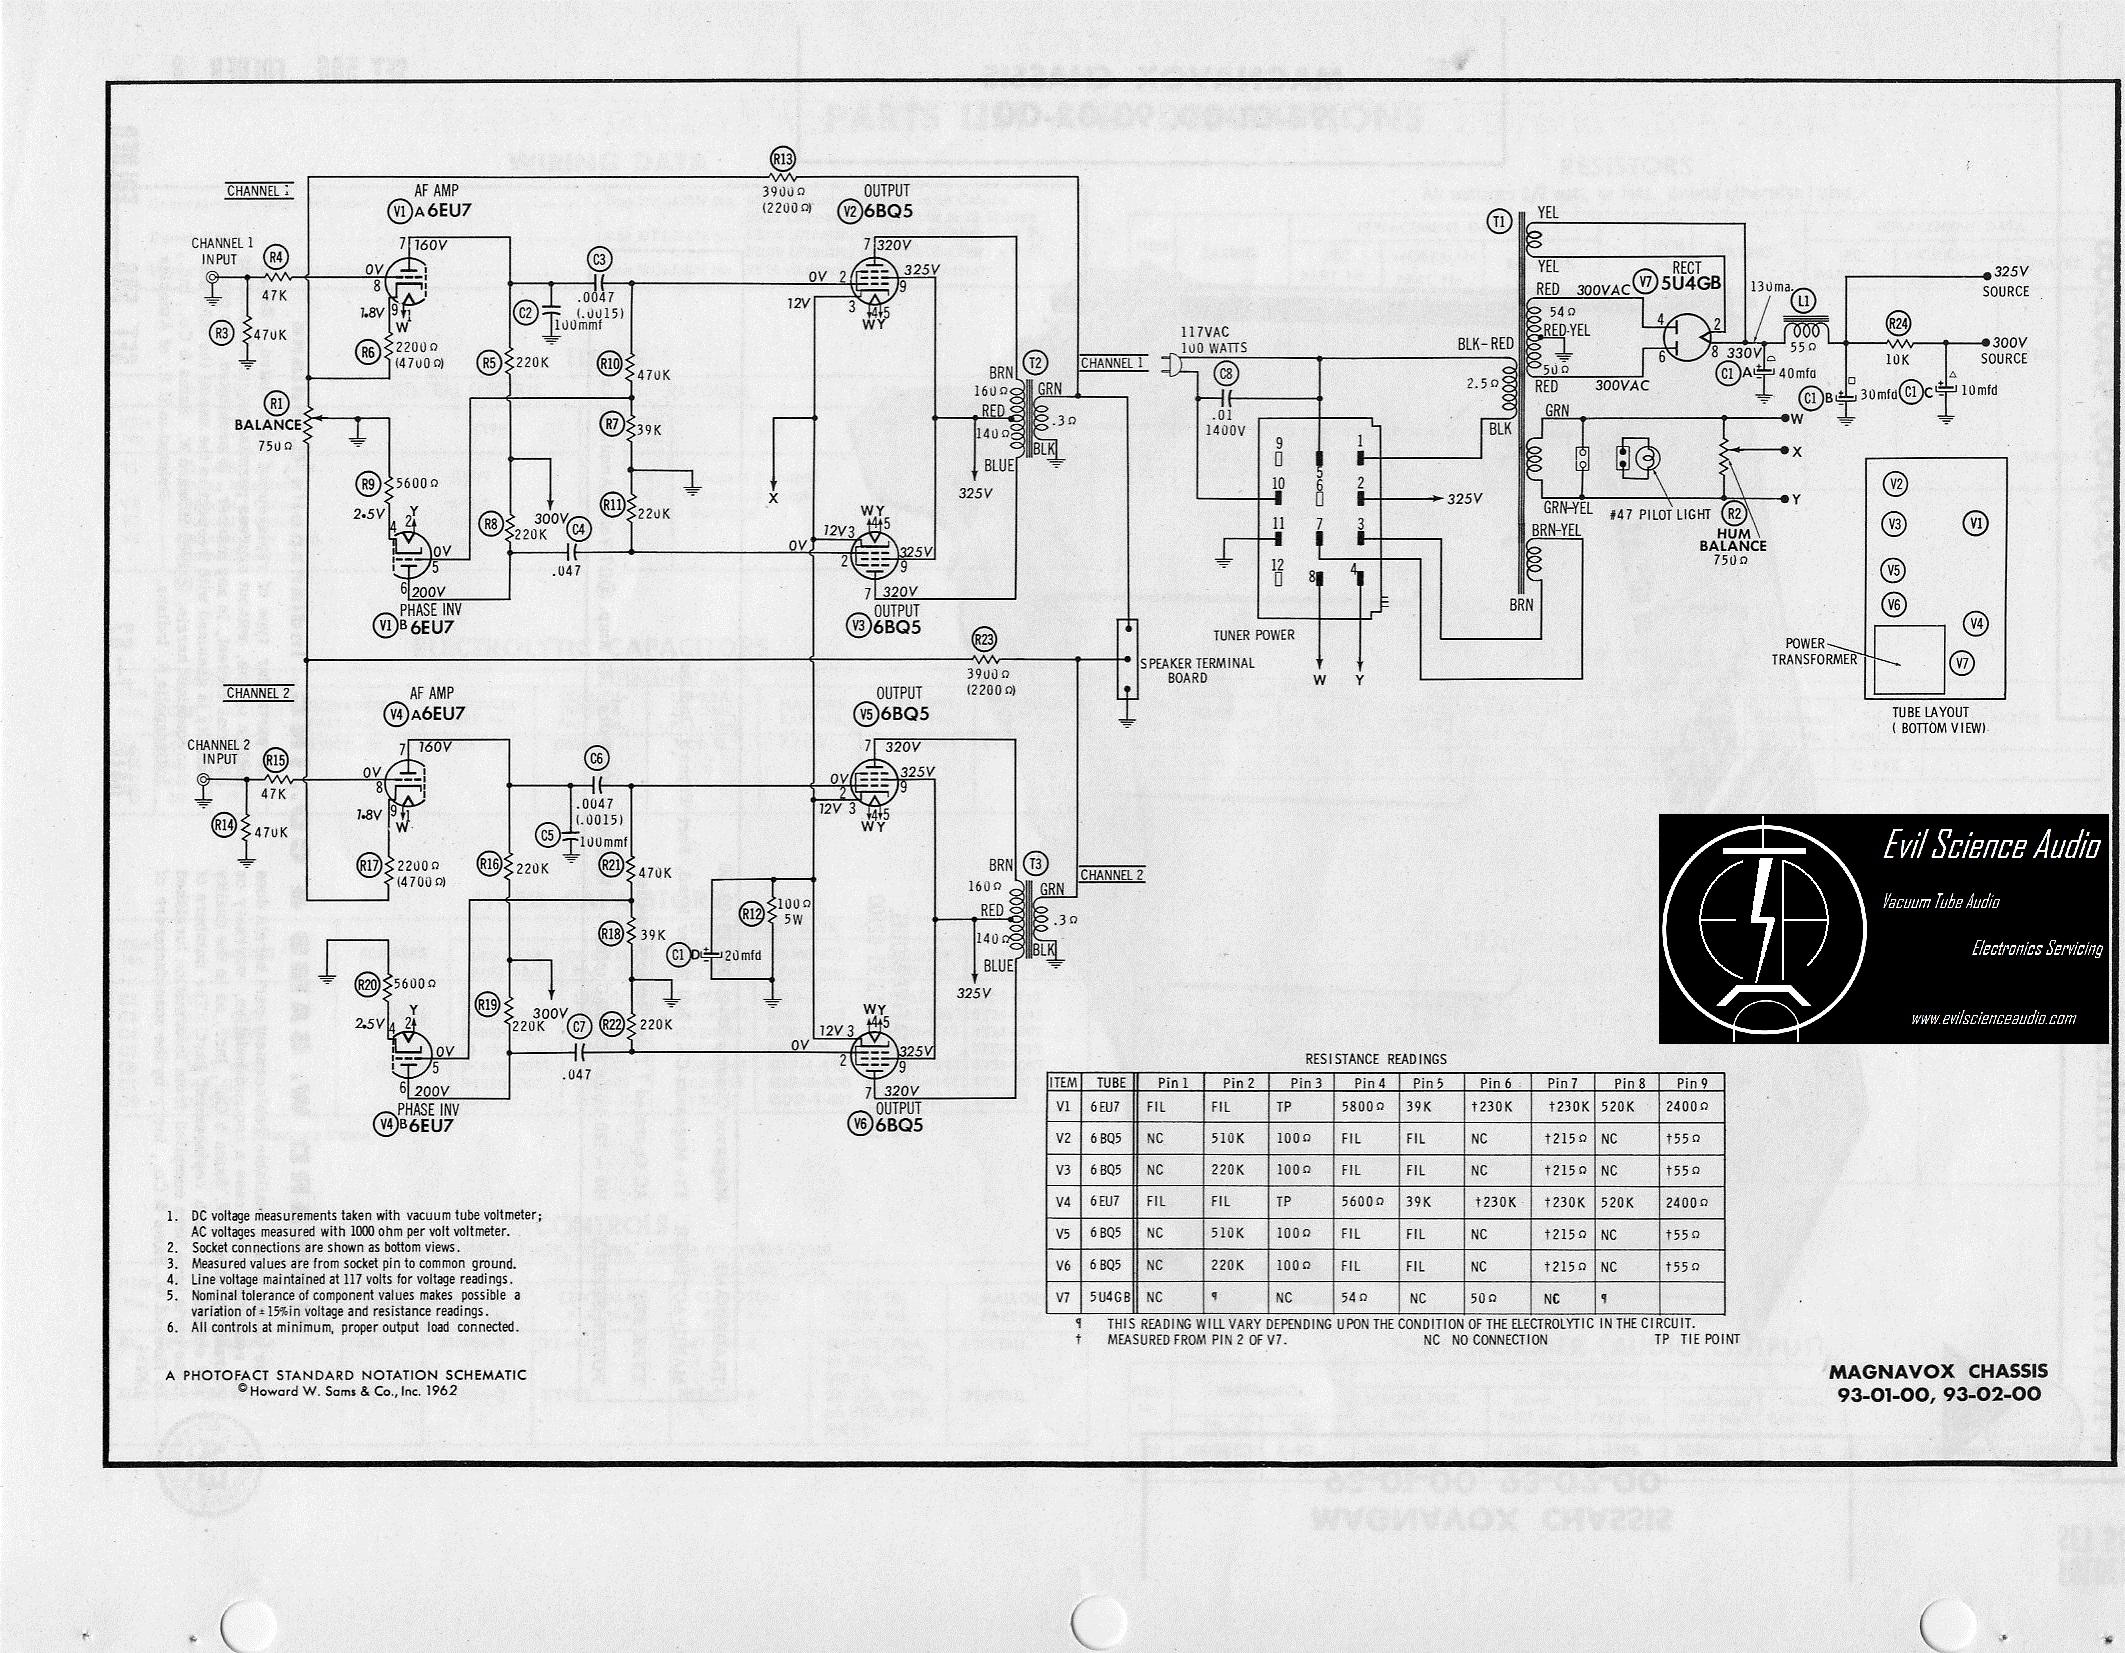 Volvo Vnl64t Wiring Diagramhtml Auto Electrical Diagram Magnavox Dc